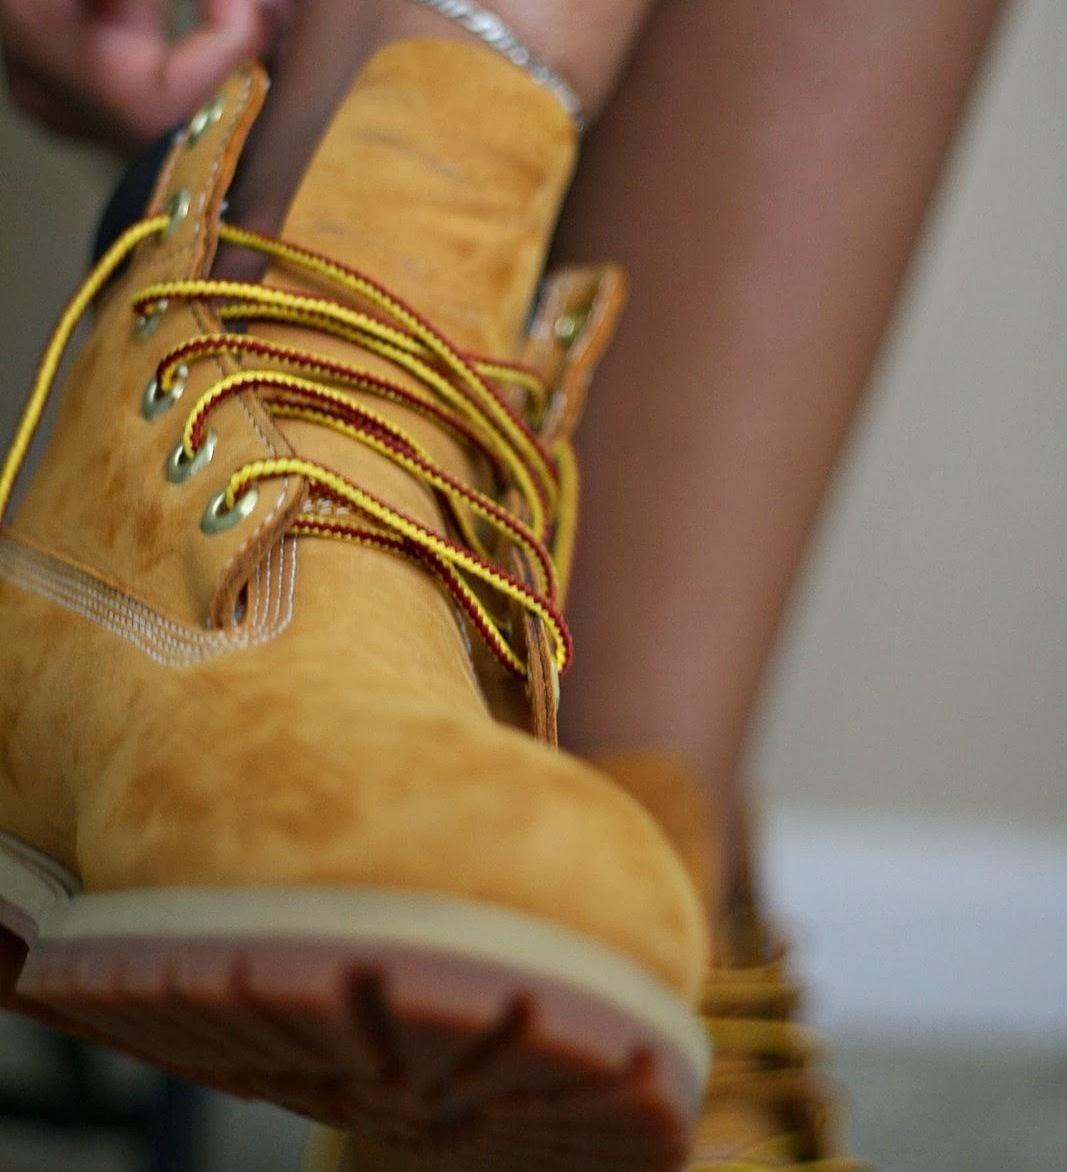 Botas Timberland Hombre MercadoLibre Colombia - fotos de zapatos timberland